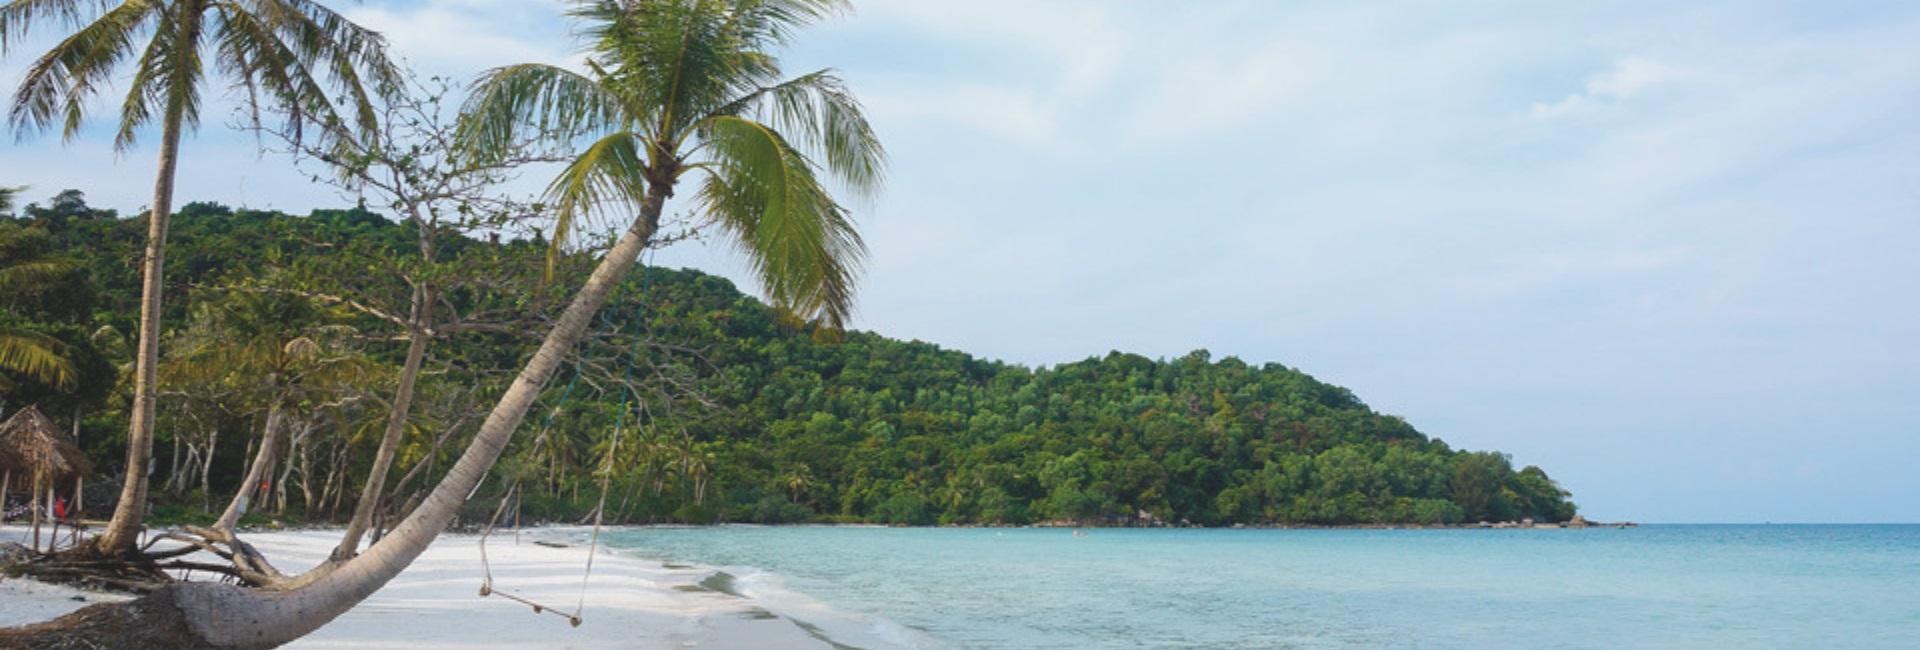 Phu Quoc Beach Break 4 Days